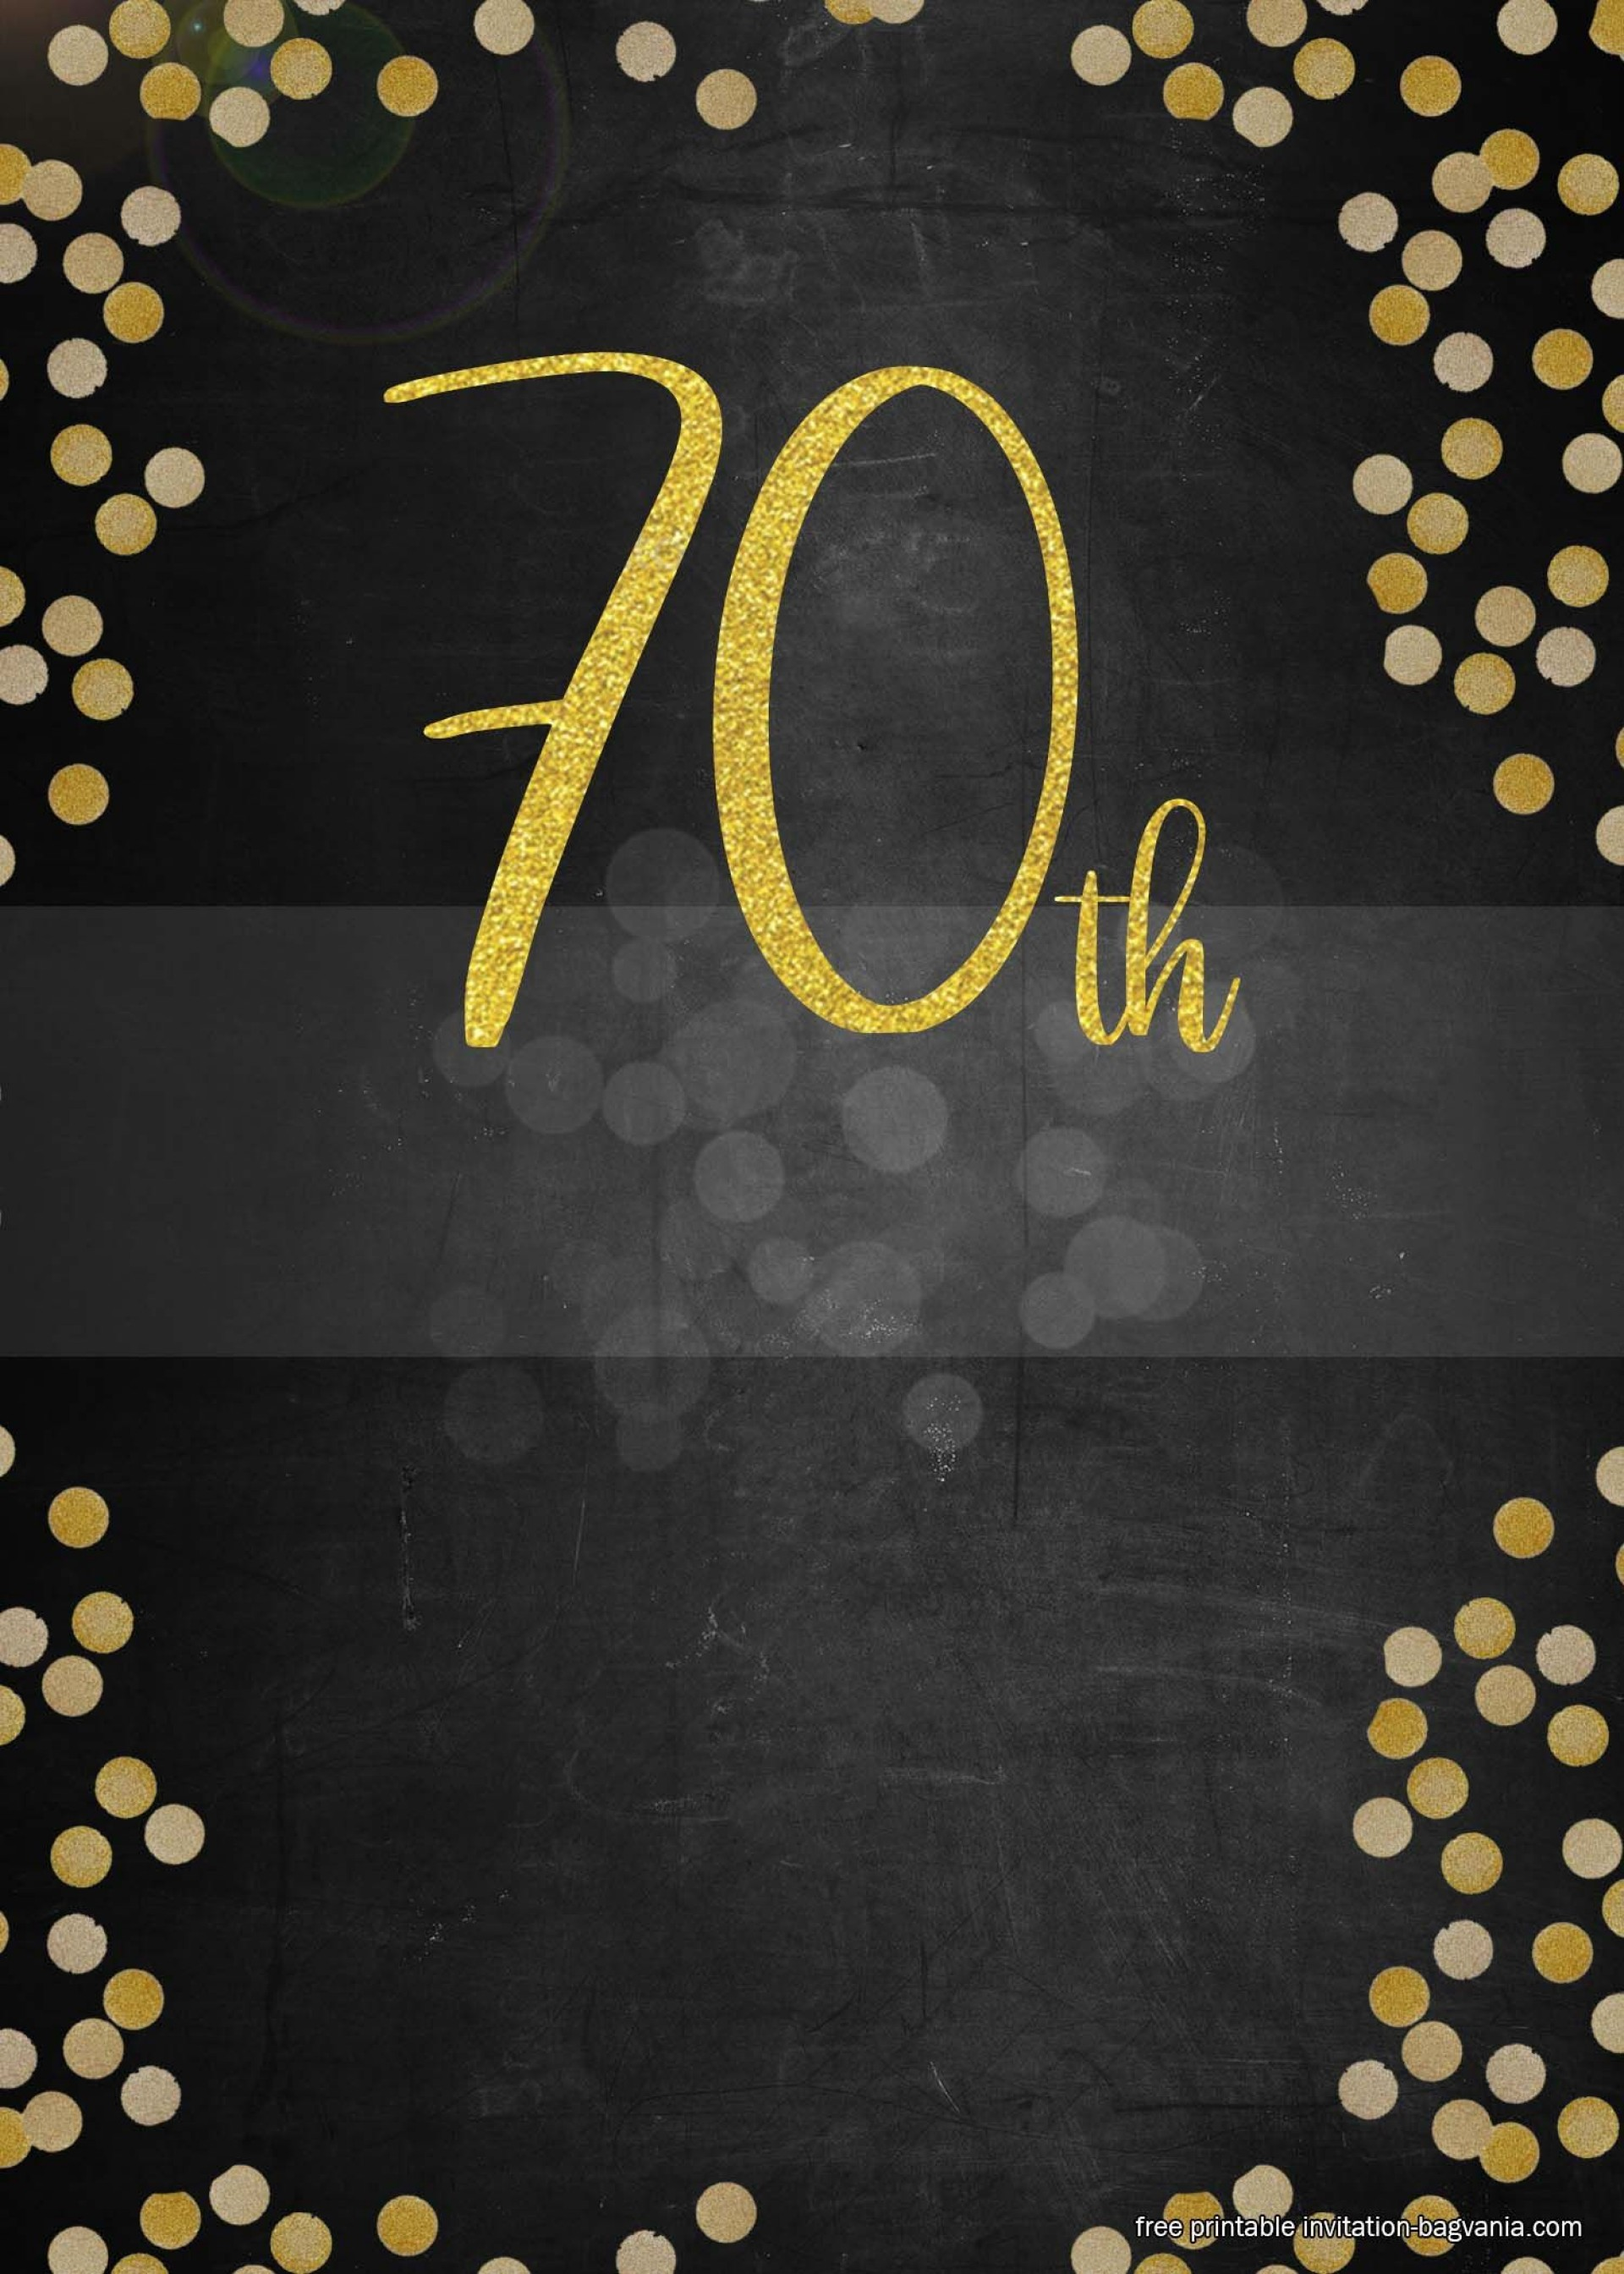 006 Striking 70th Birthday Invitation Template Free Inspiration  Surprise Invite With Photo1920